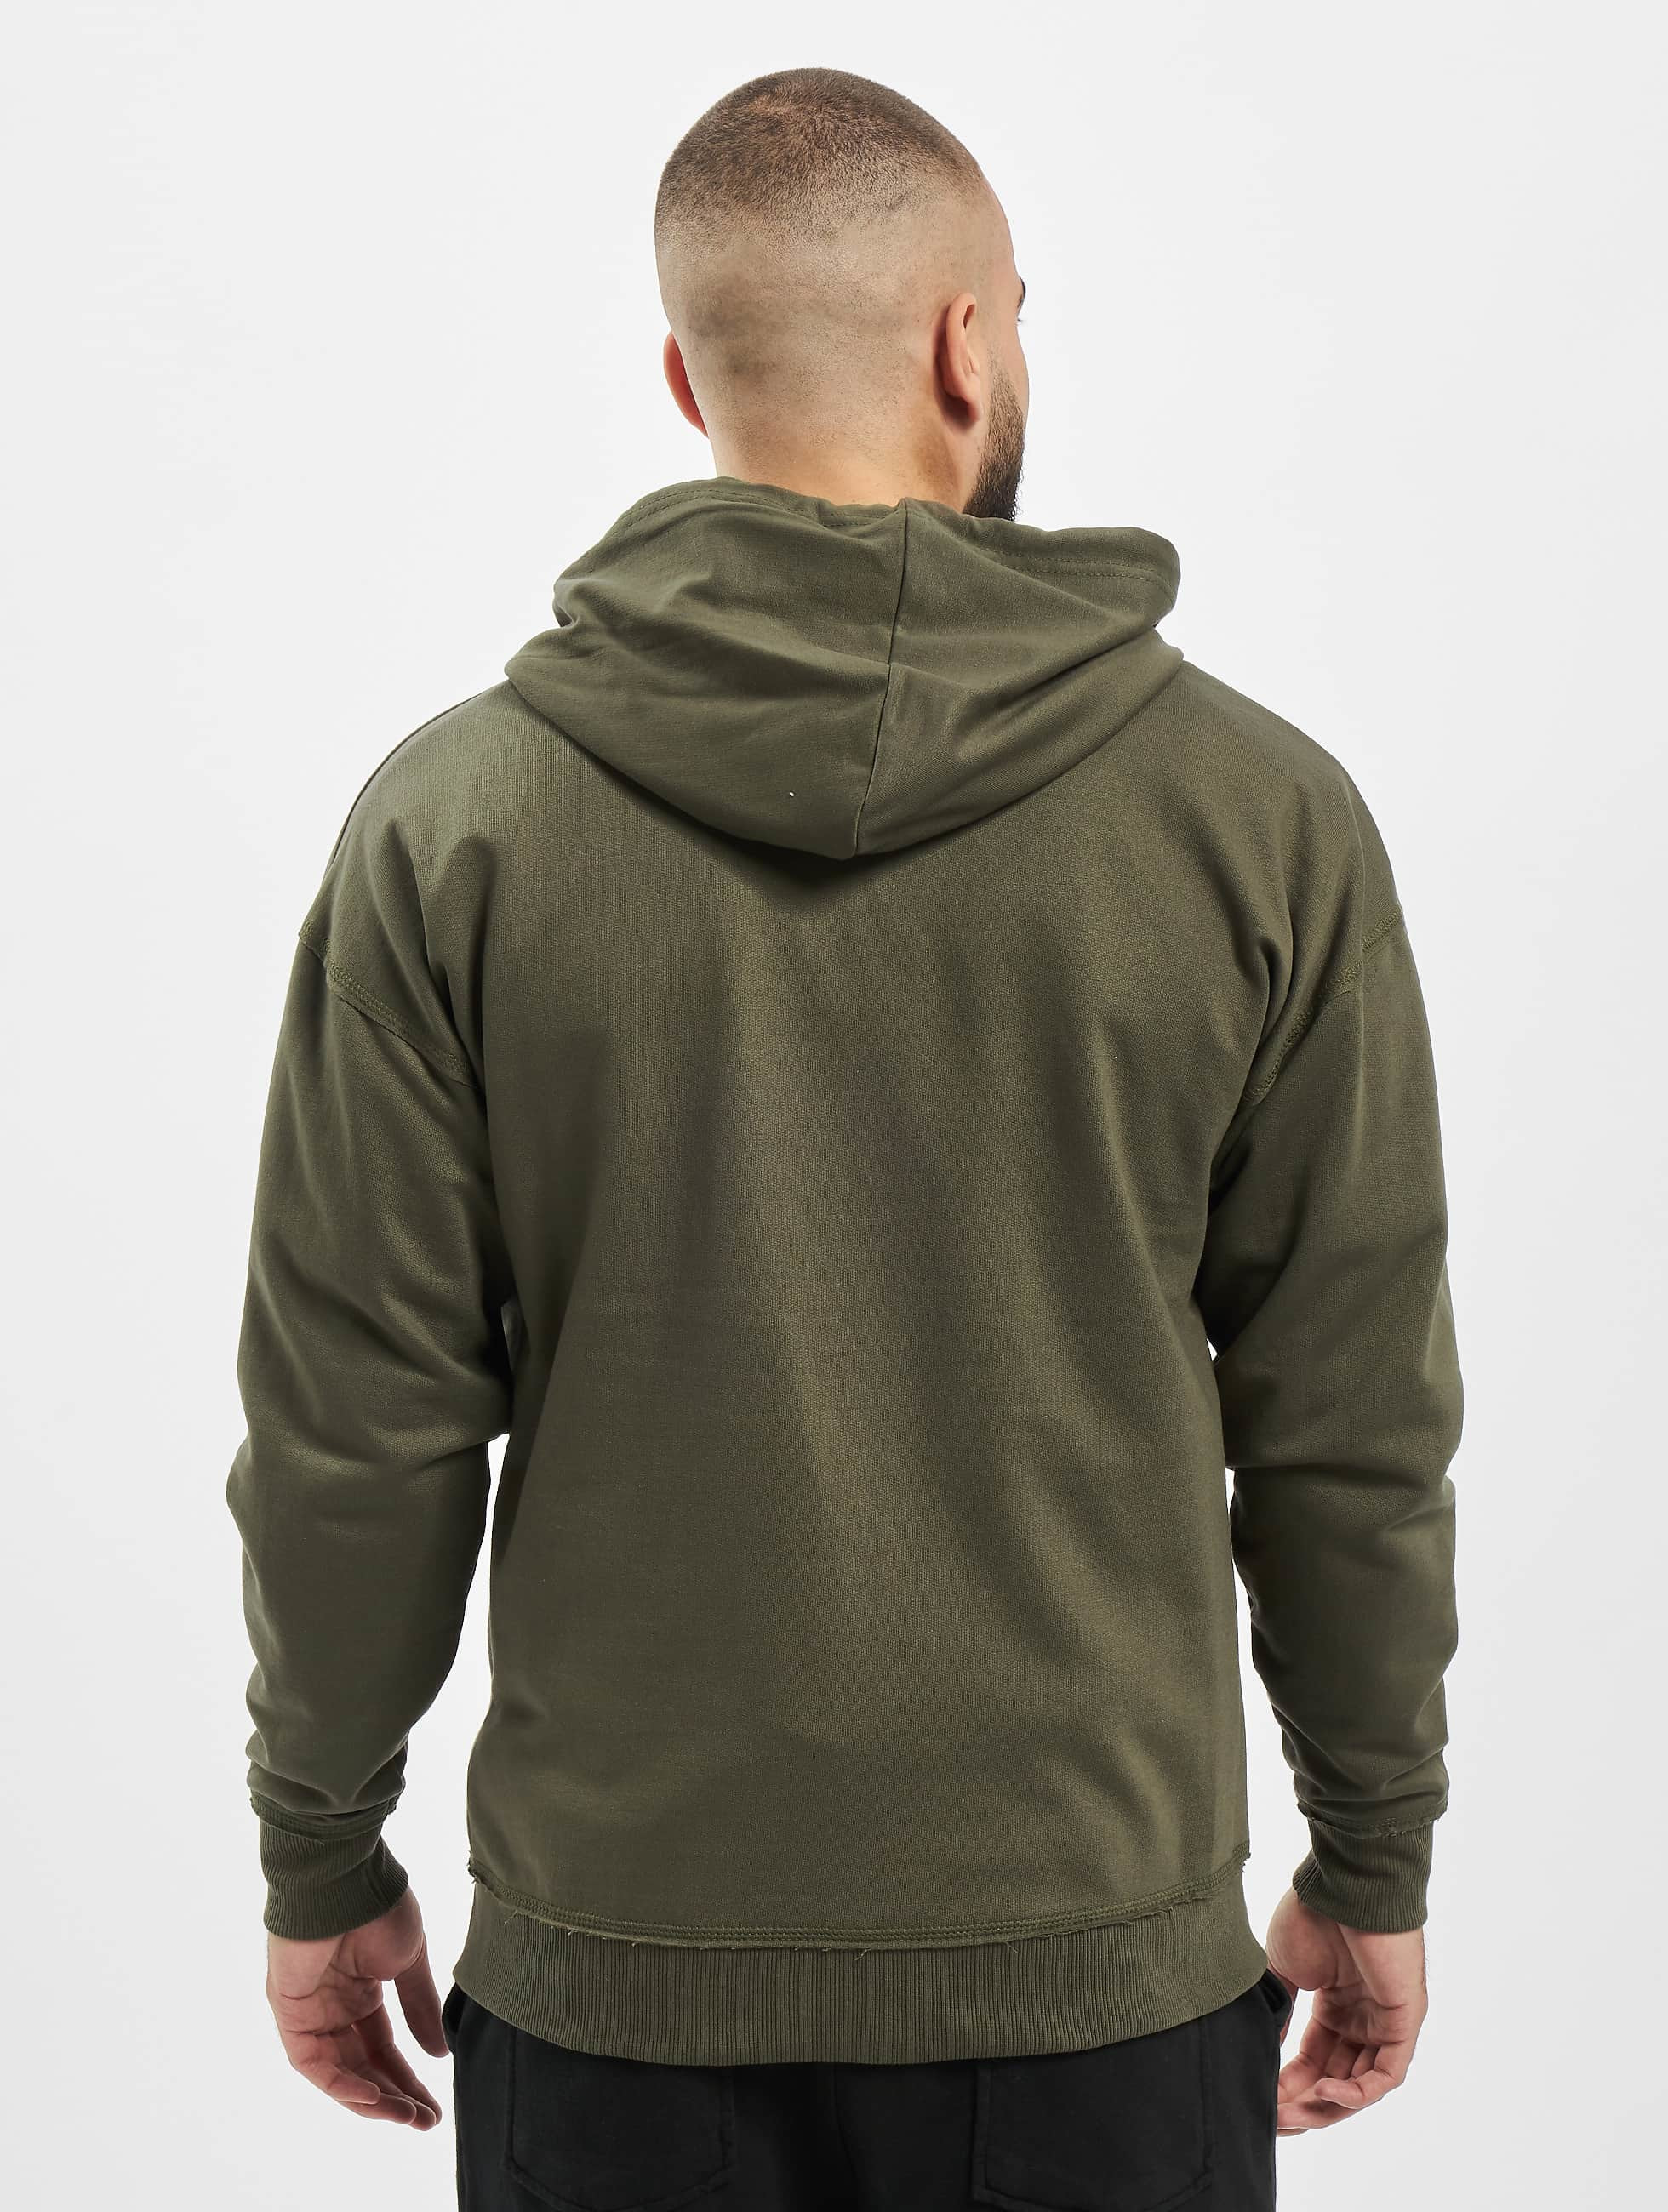 Urban Classics Zip Hoodie Oversized olive